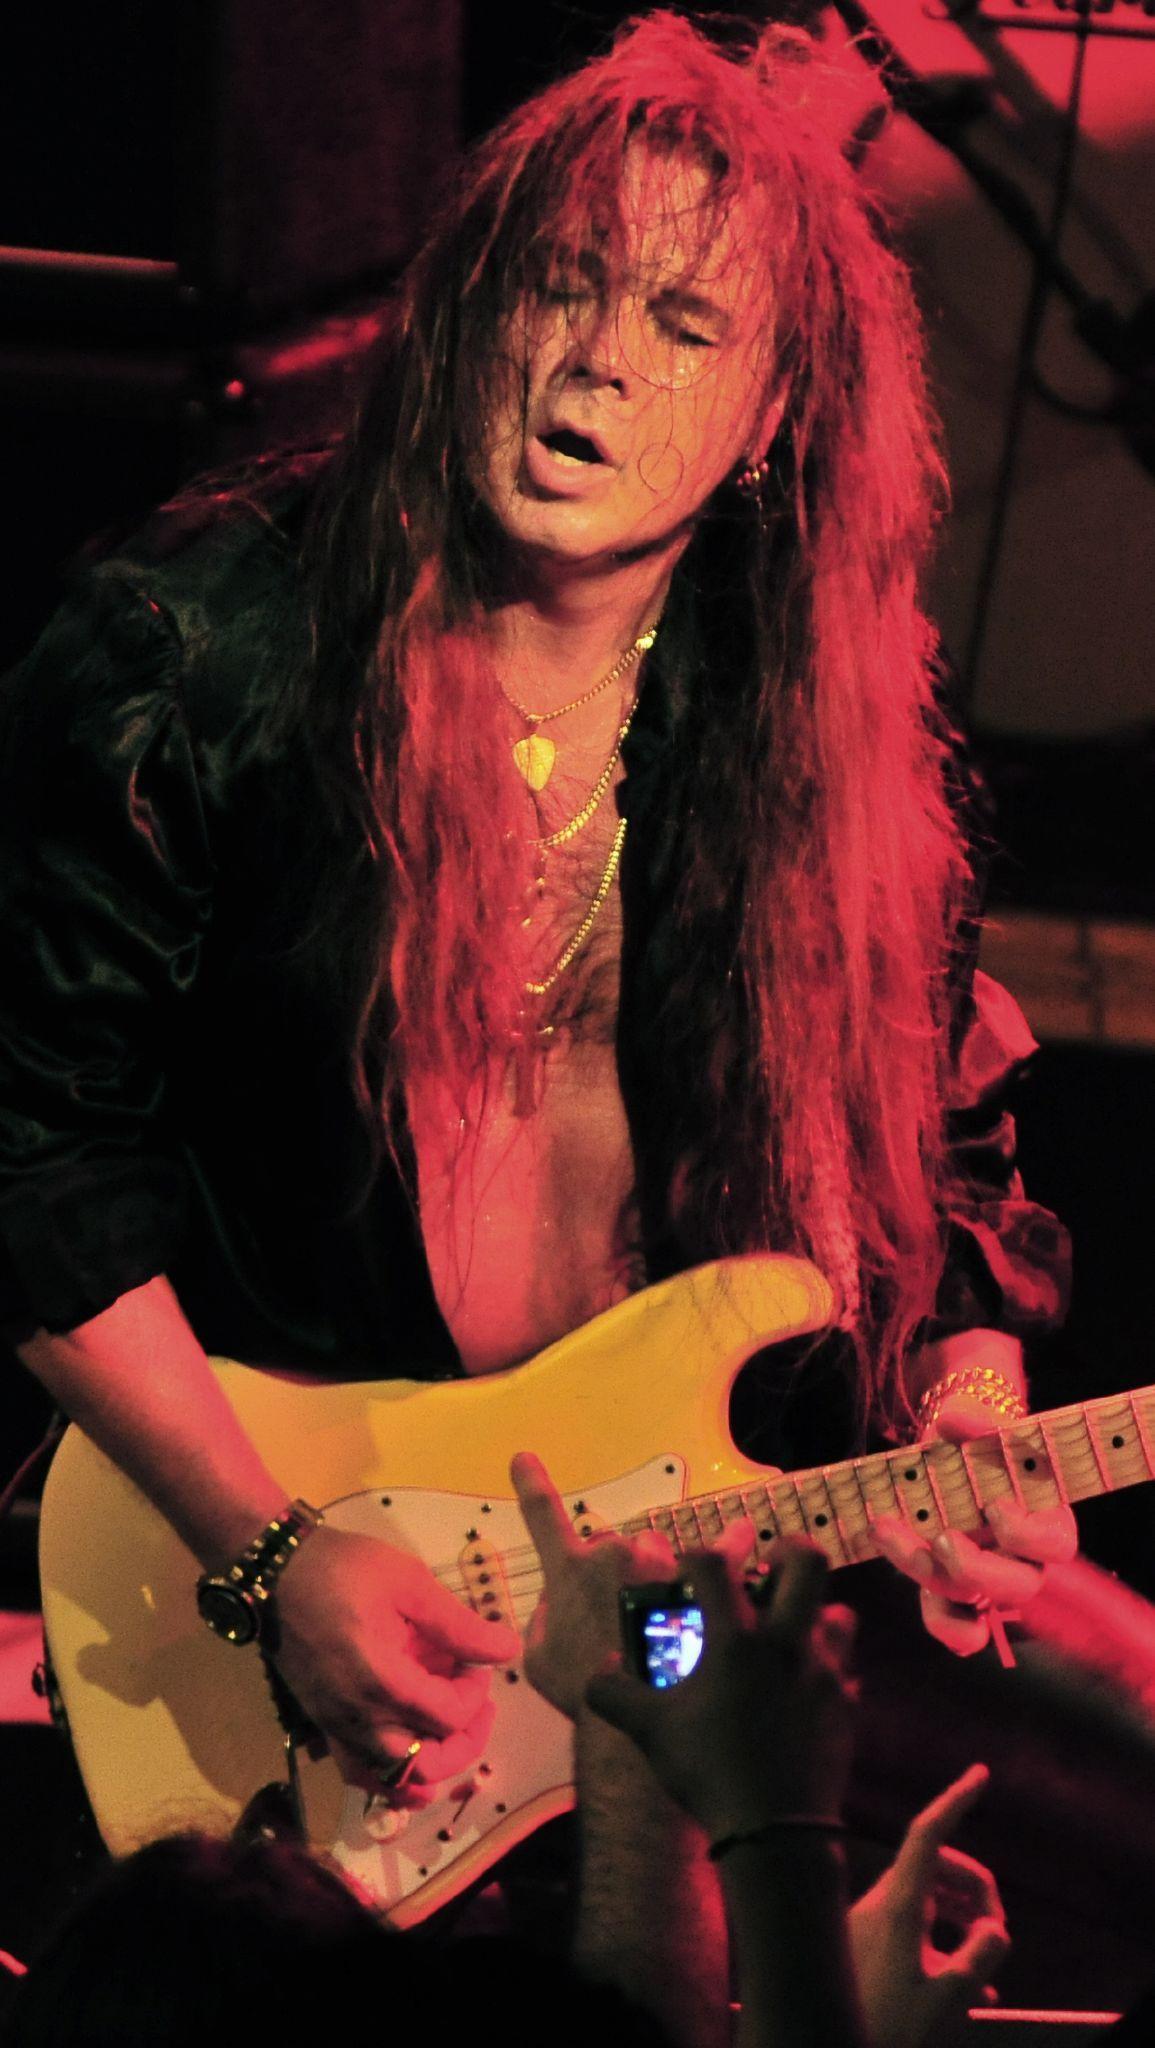 Pin De Shaurya Vikram Singh Em Randomness Guitarra Criticos Rock N Roll